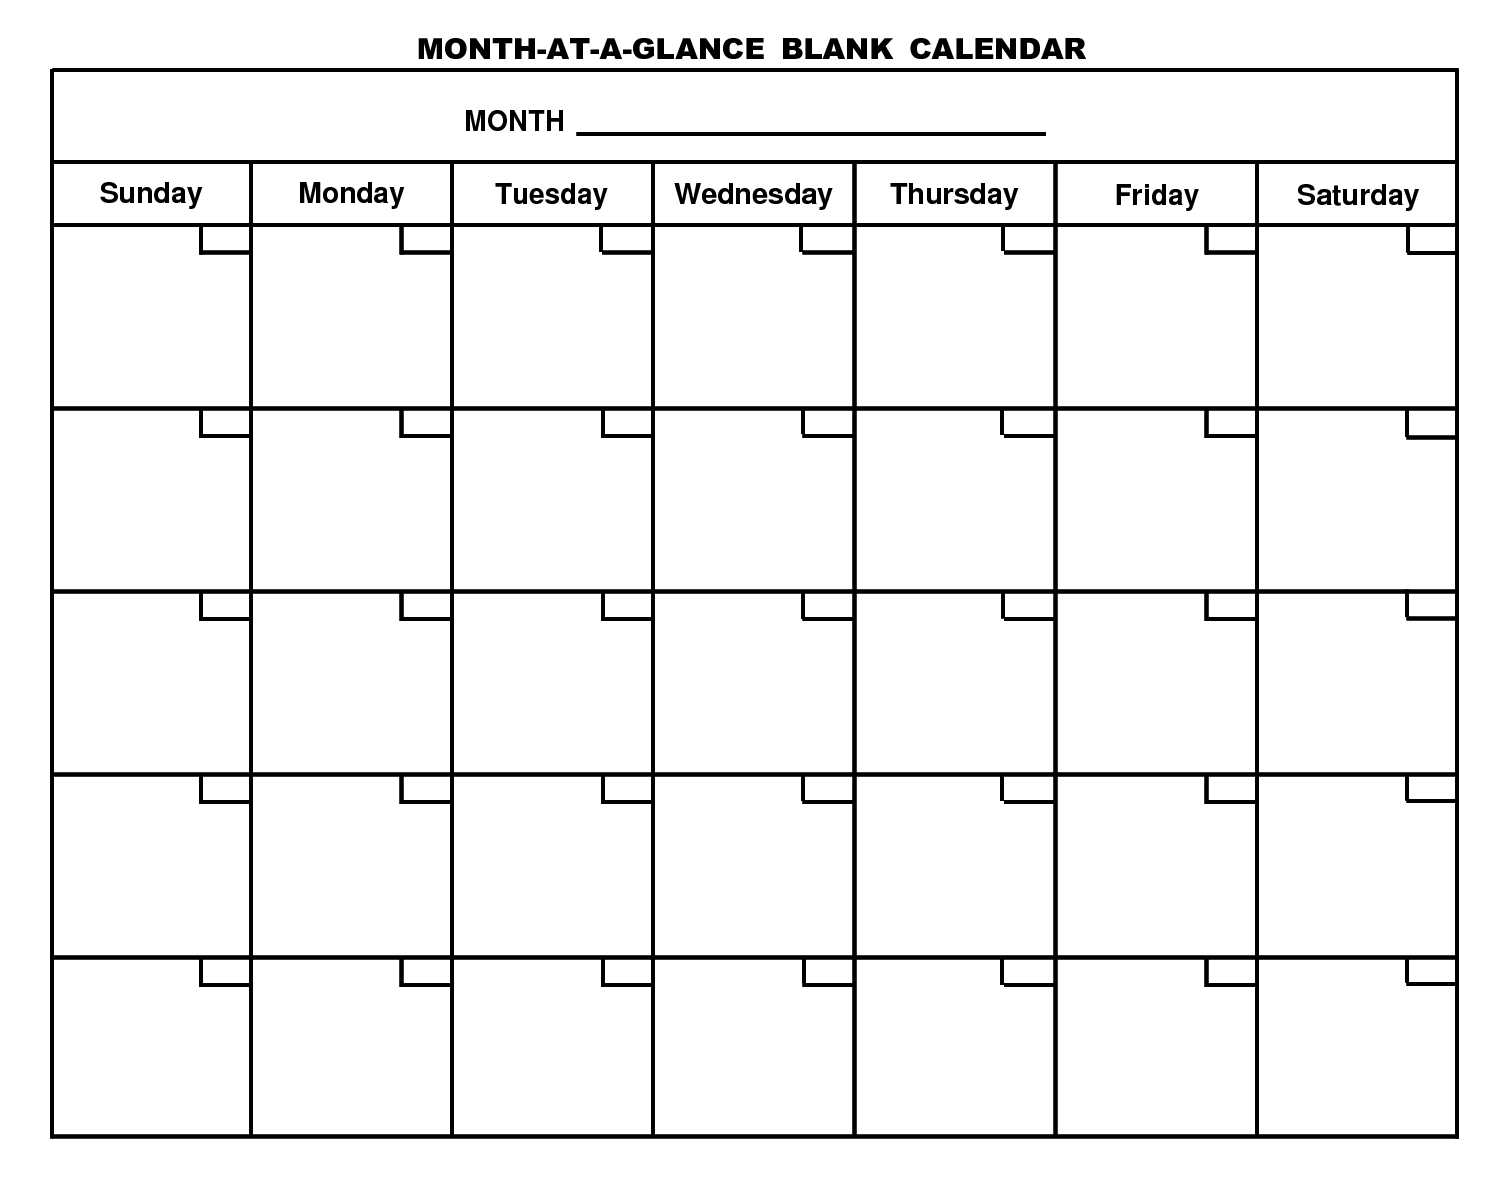 Printable Blank Year Calendar 2013 | Vertical Monthly 8X11 Printable Monthly Calendar